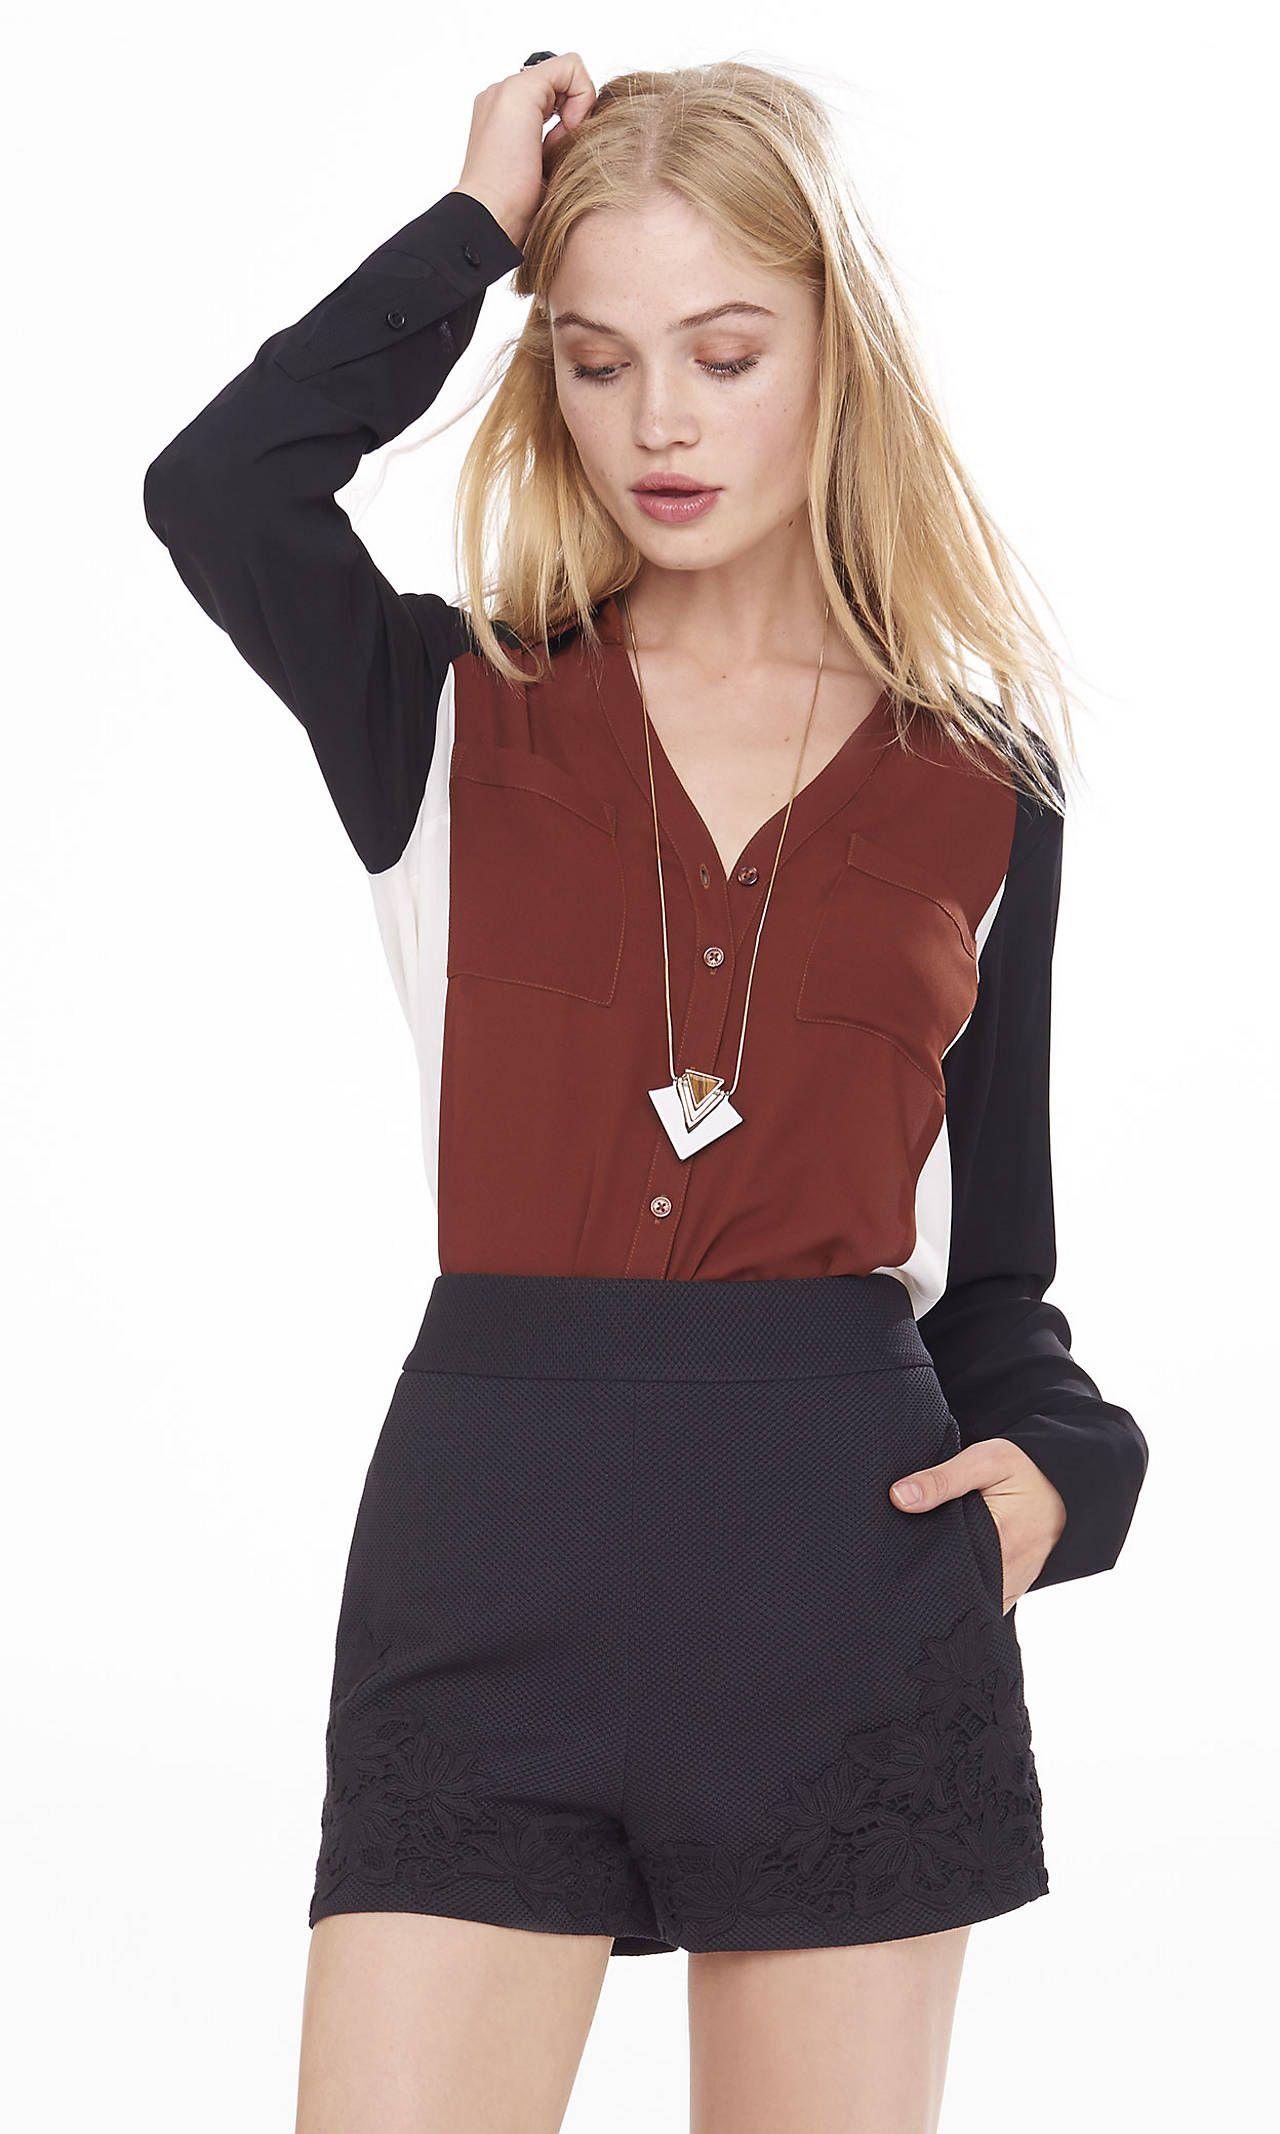 55860de808f27 Original Fit Color Block Portofino Shirt from EXPRESS